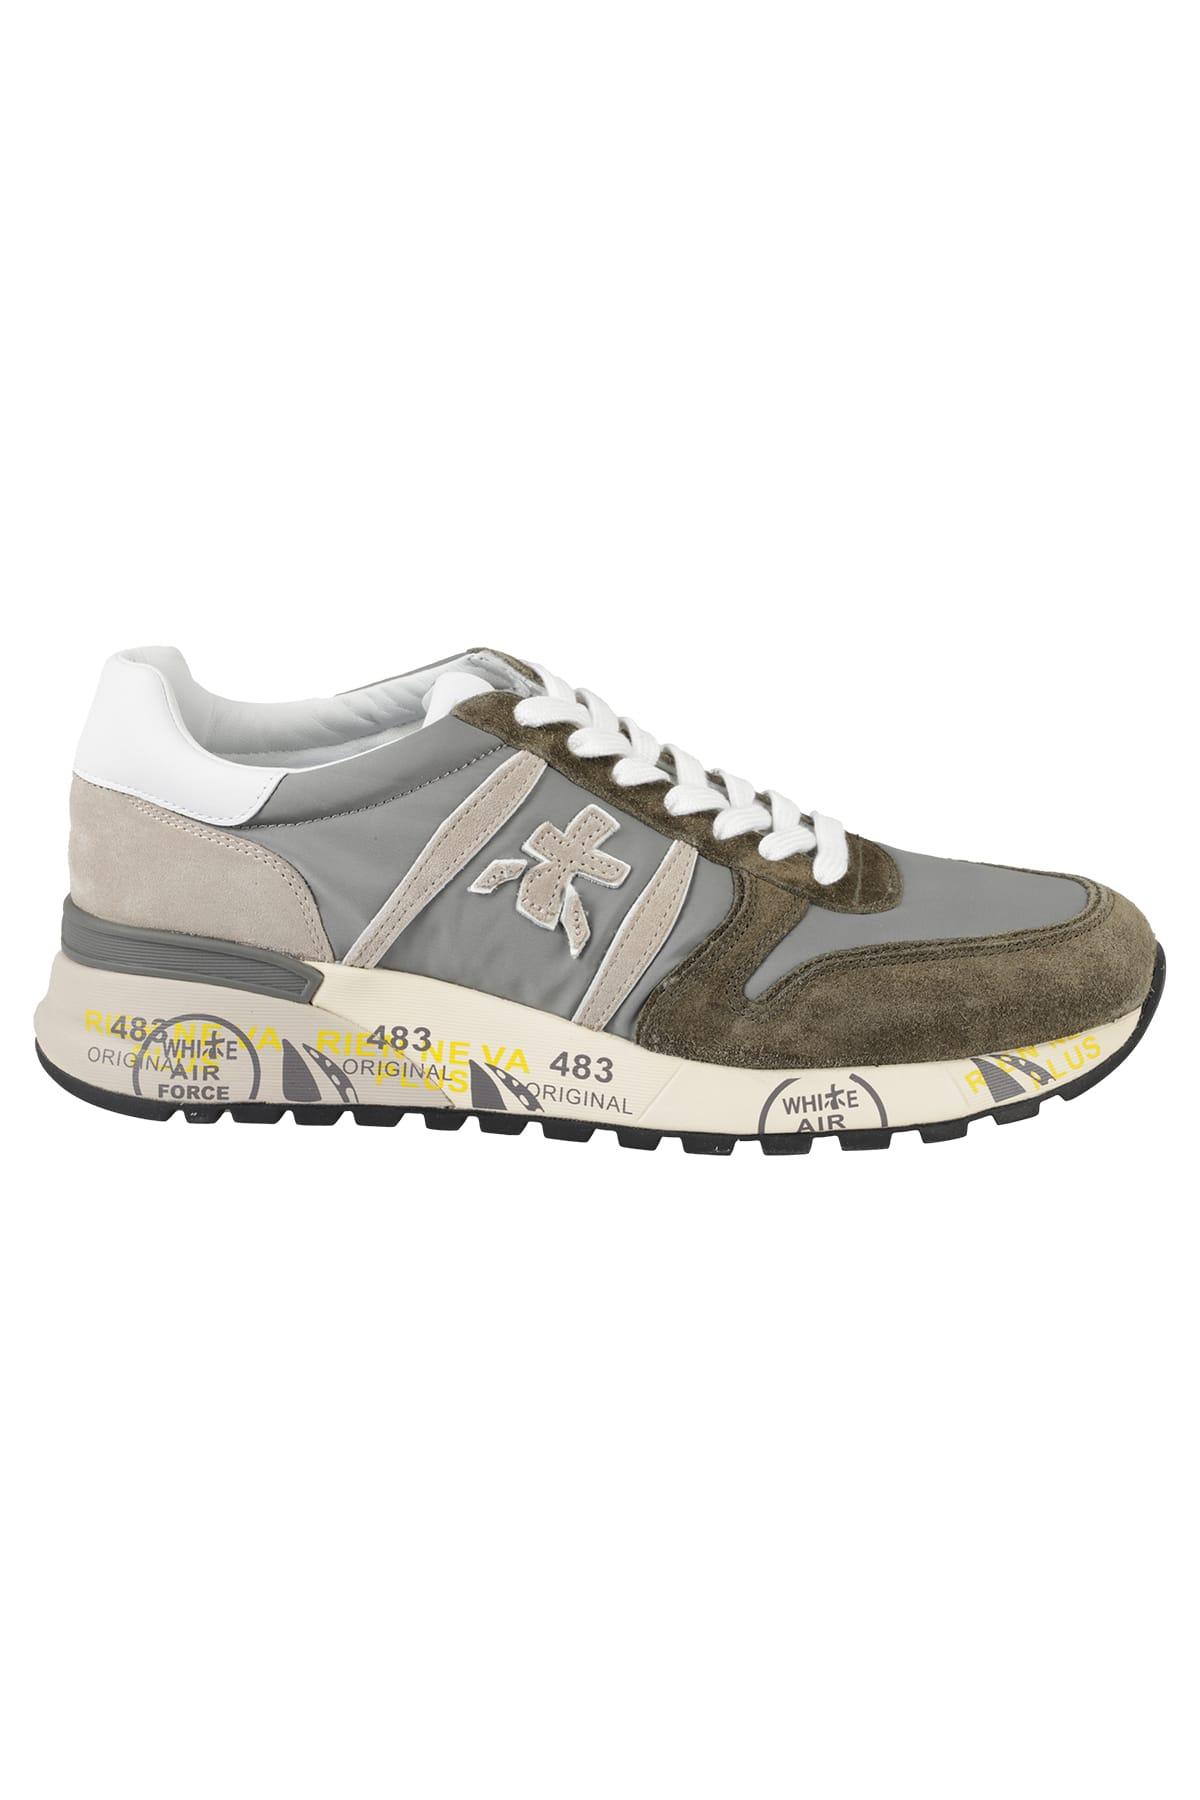 Premiata Shoes SNEAKERS